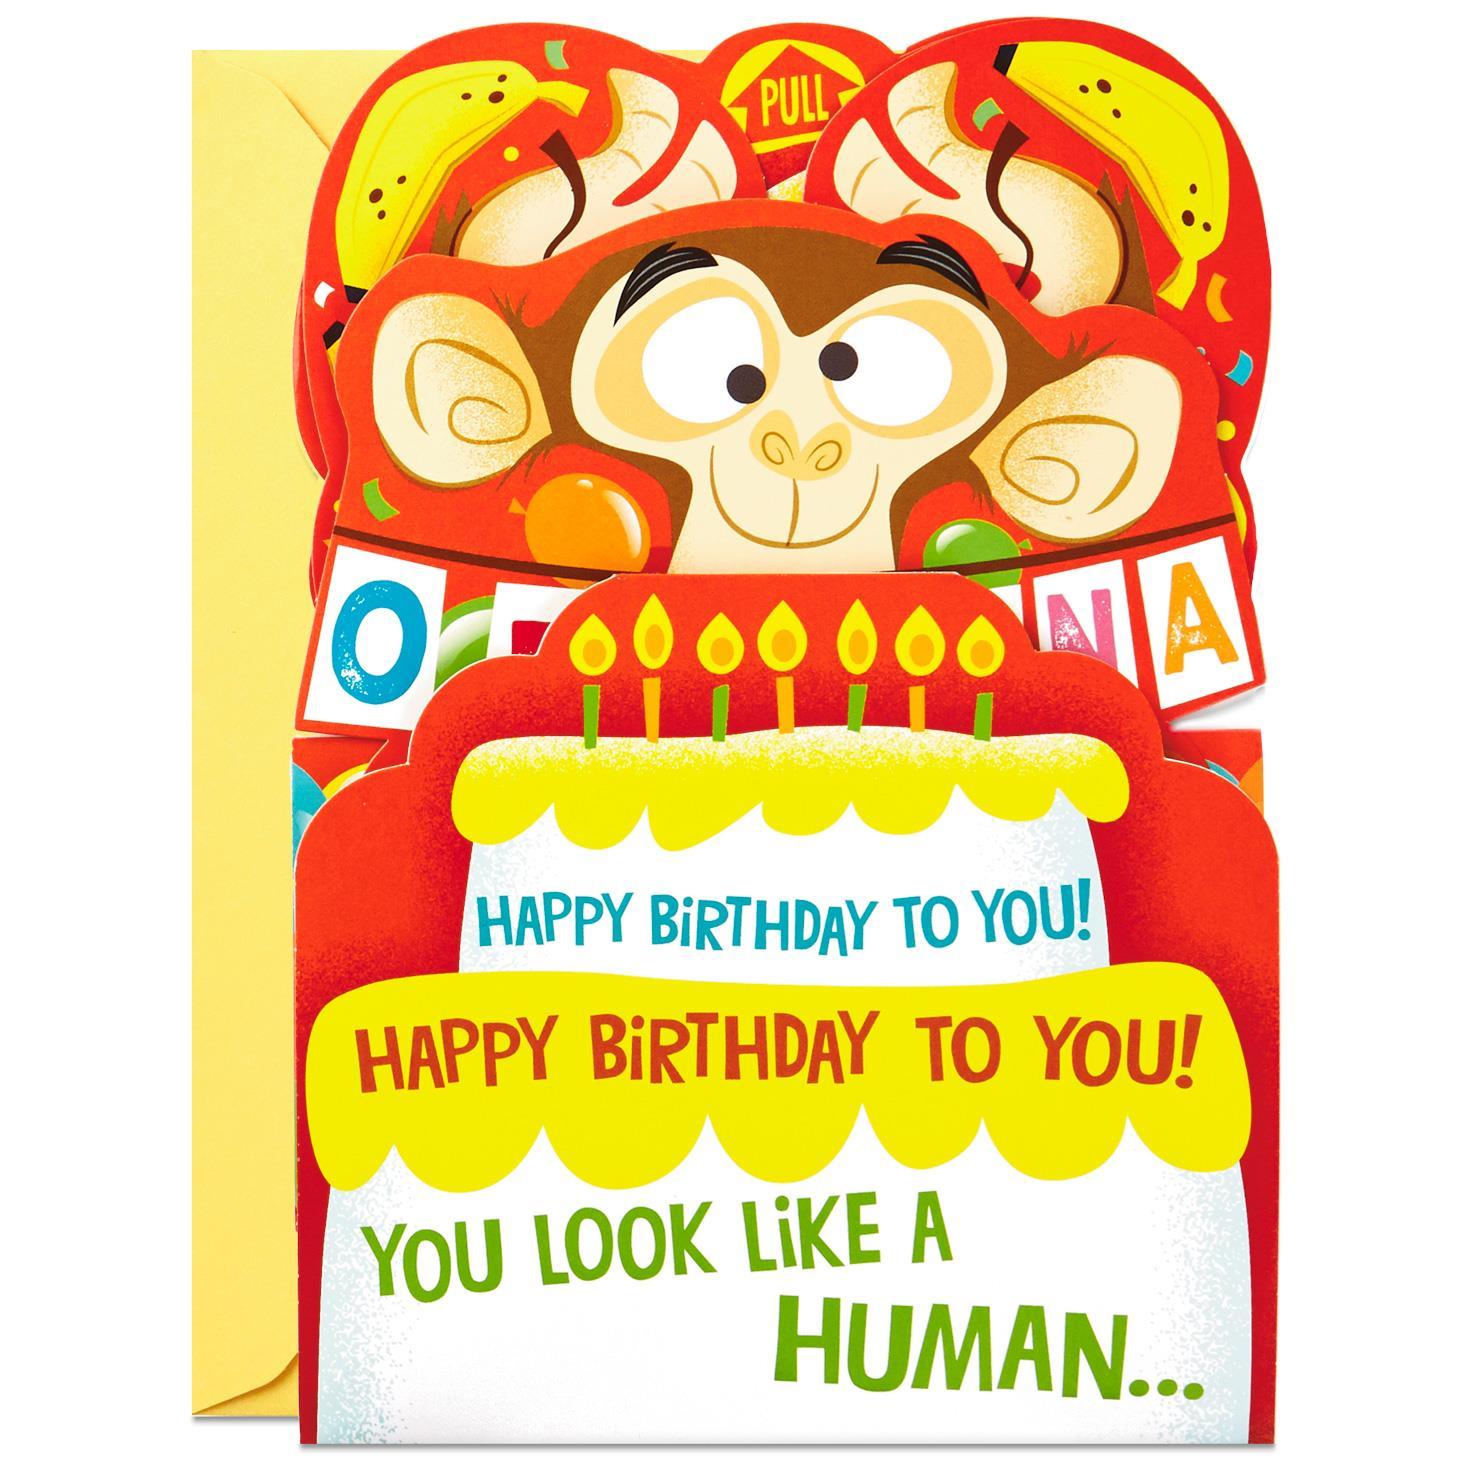 Go Bananas Monkey Pop Up Birthday Card Greeting Cards Hallmark